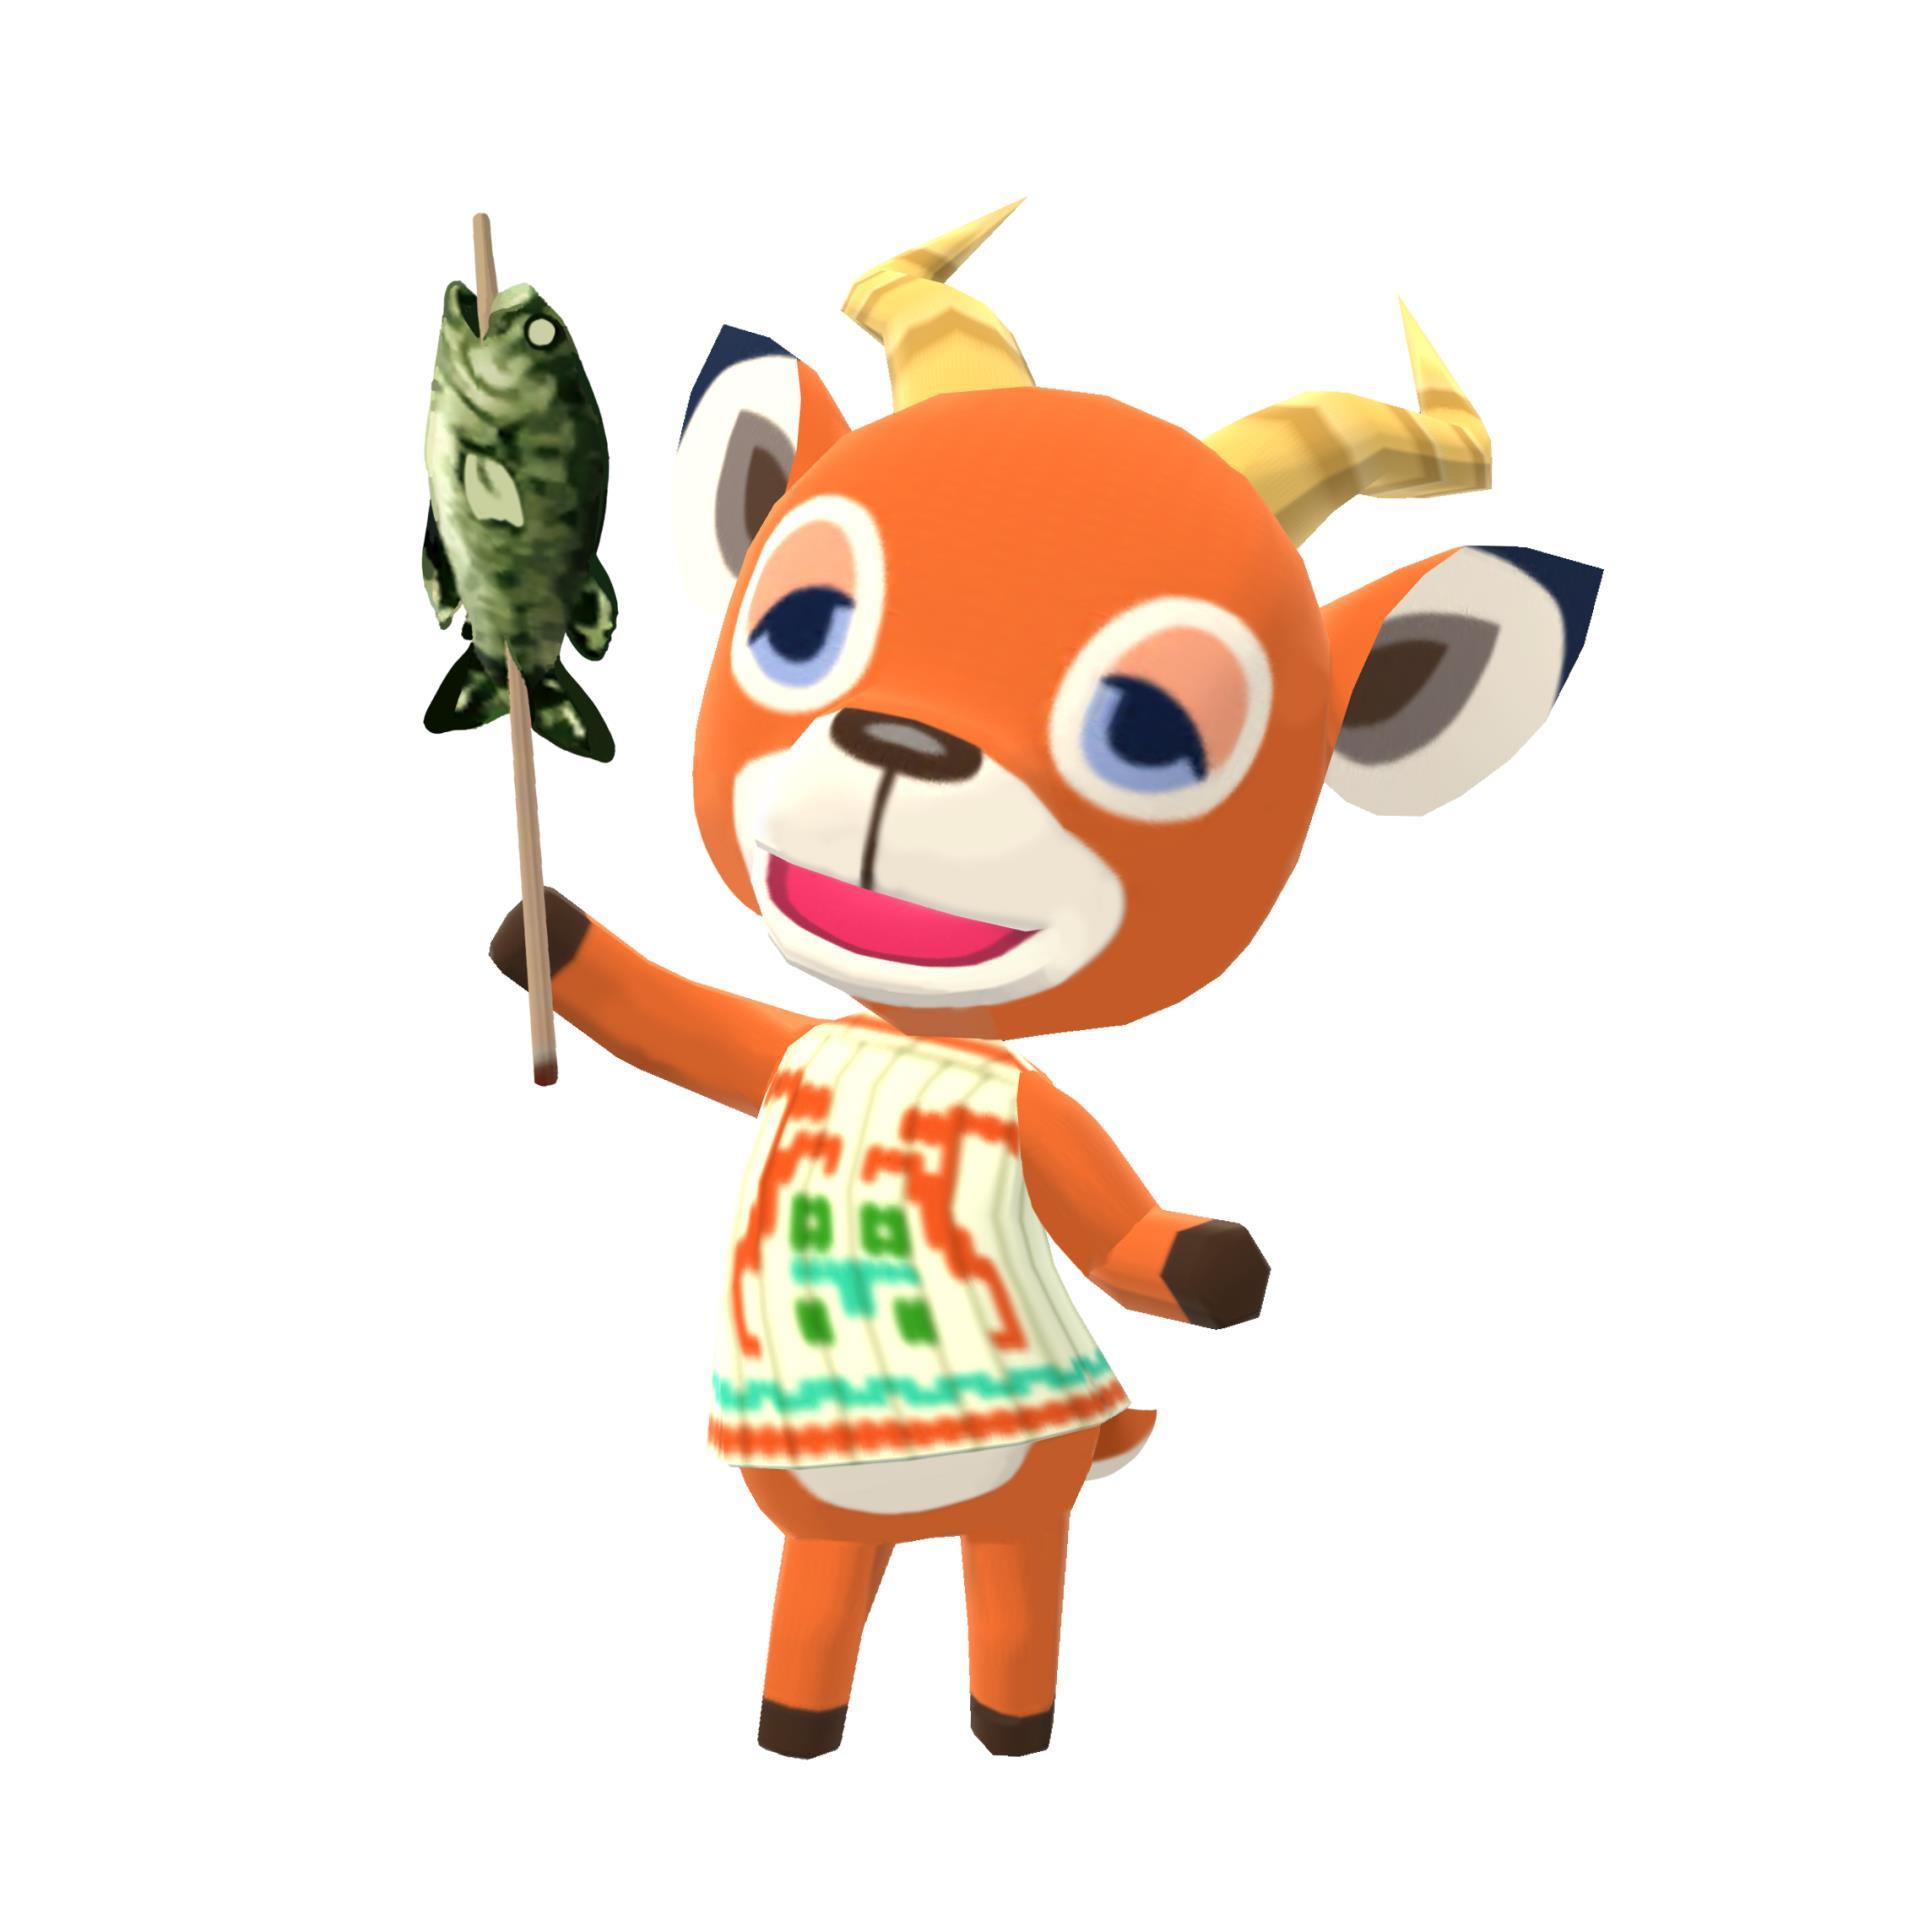 1920x1920 Animal Crossing Pocket Camp Art